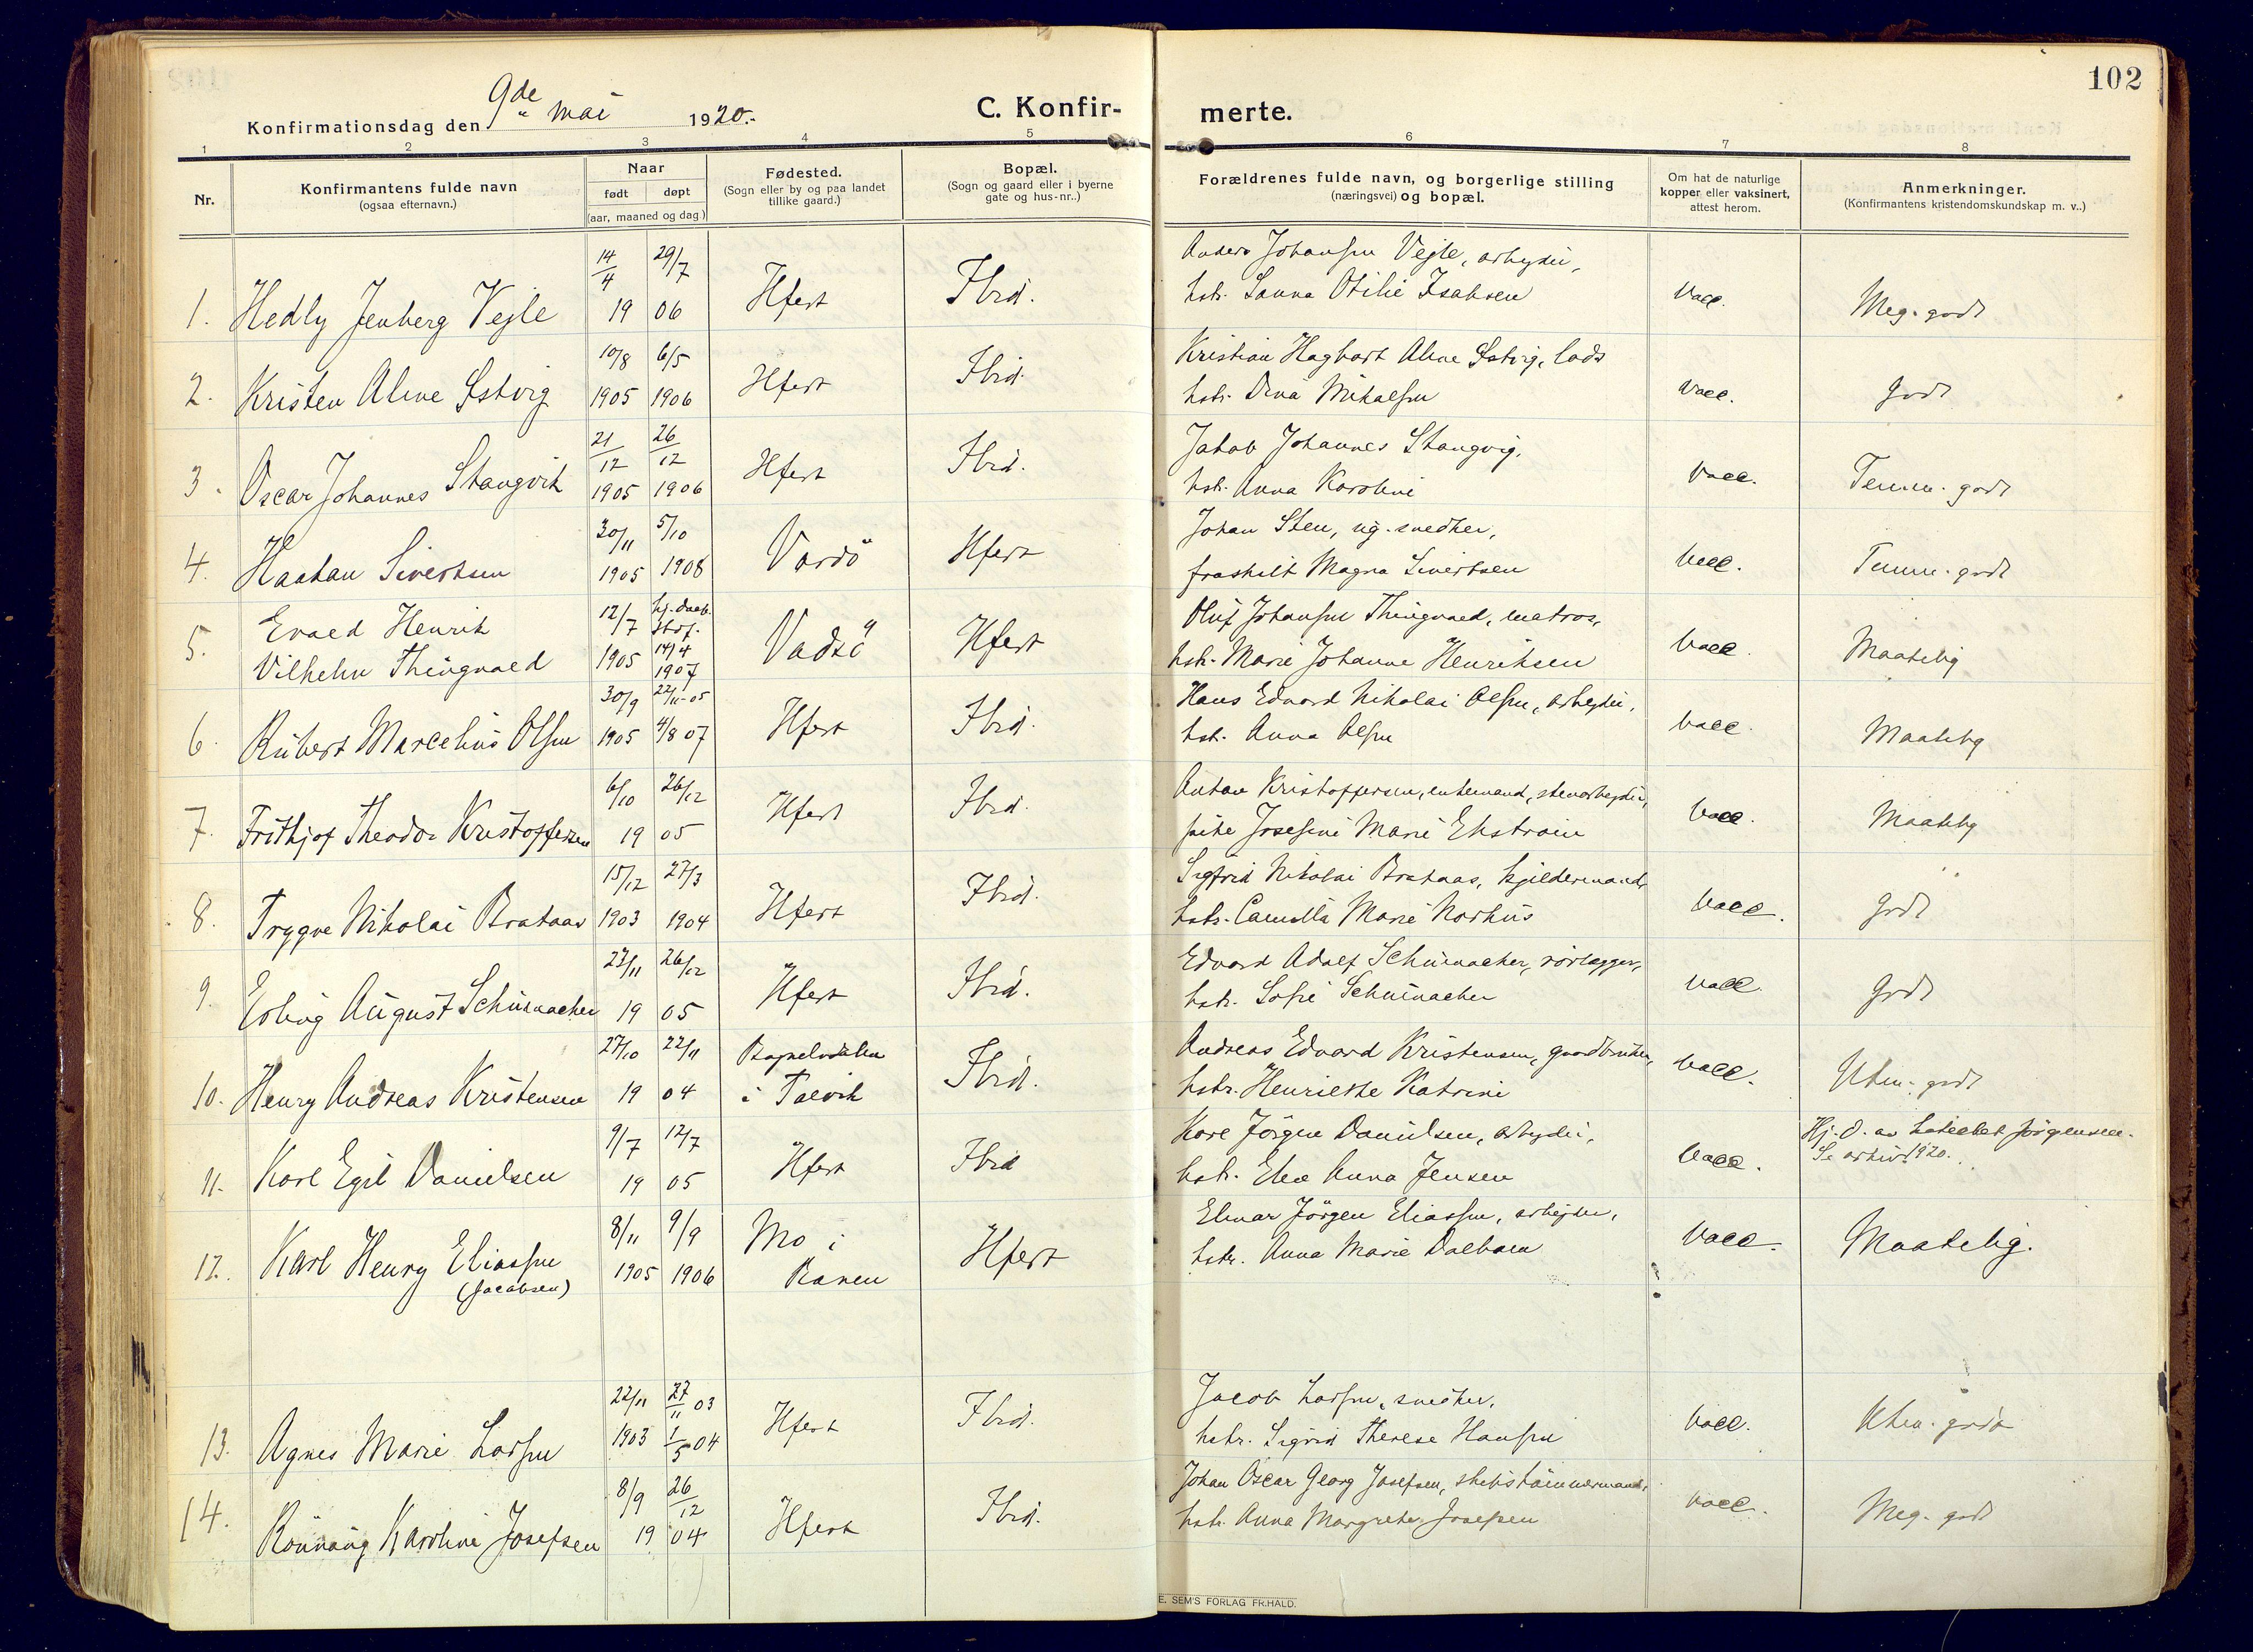 SATØ, Hammerfest sokneprestembete, Ministerialbok nr. 15, 1916-1923, s. 102